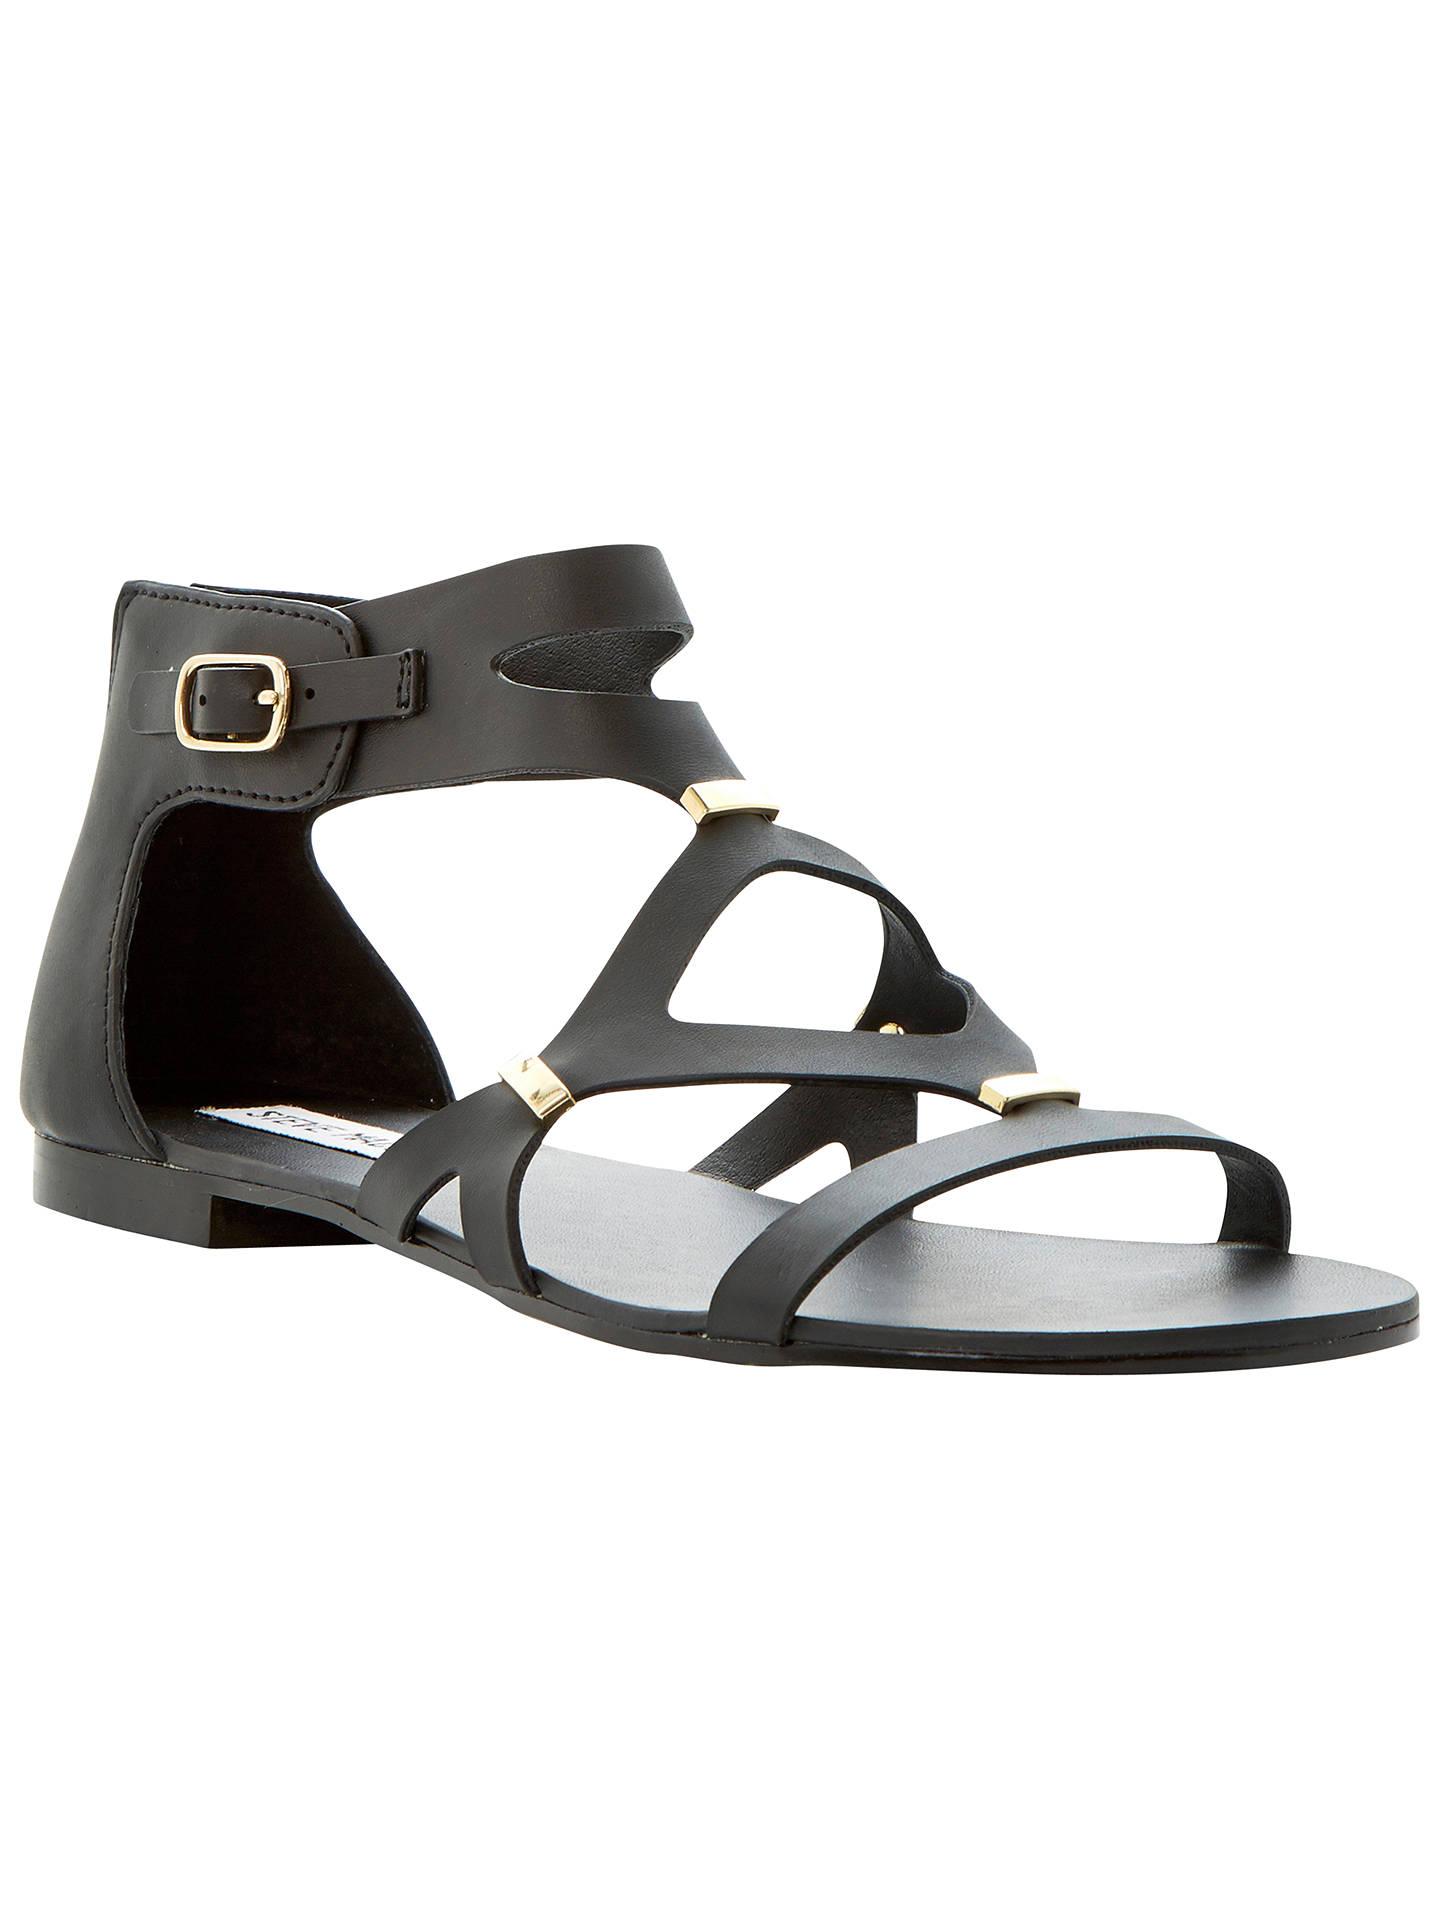 884d83906661 Steve Madden Comma Strappy Zip Back Gladiator Sandals at John Lewis ...